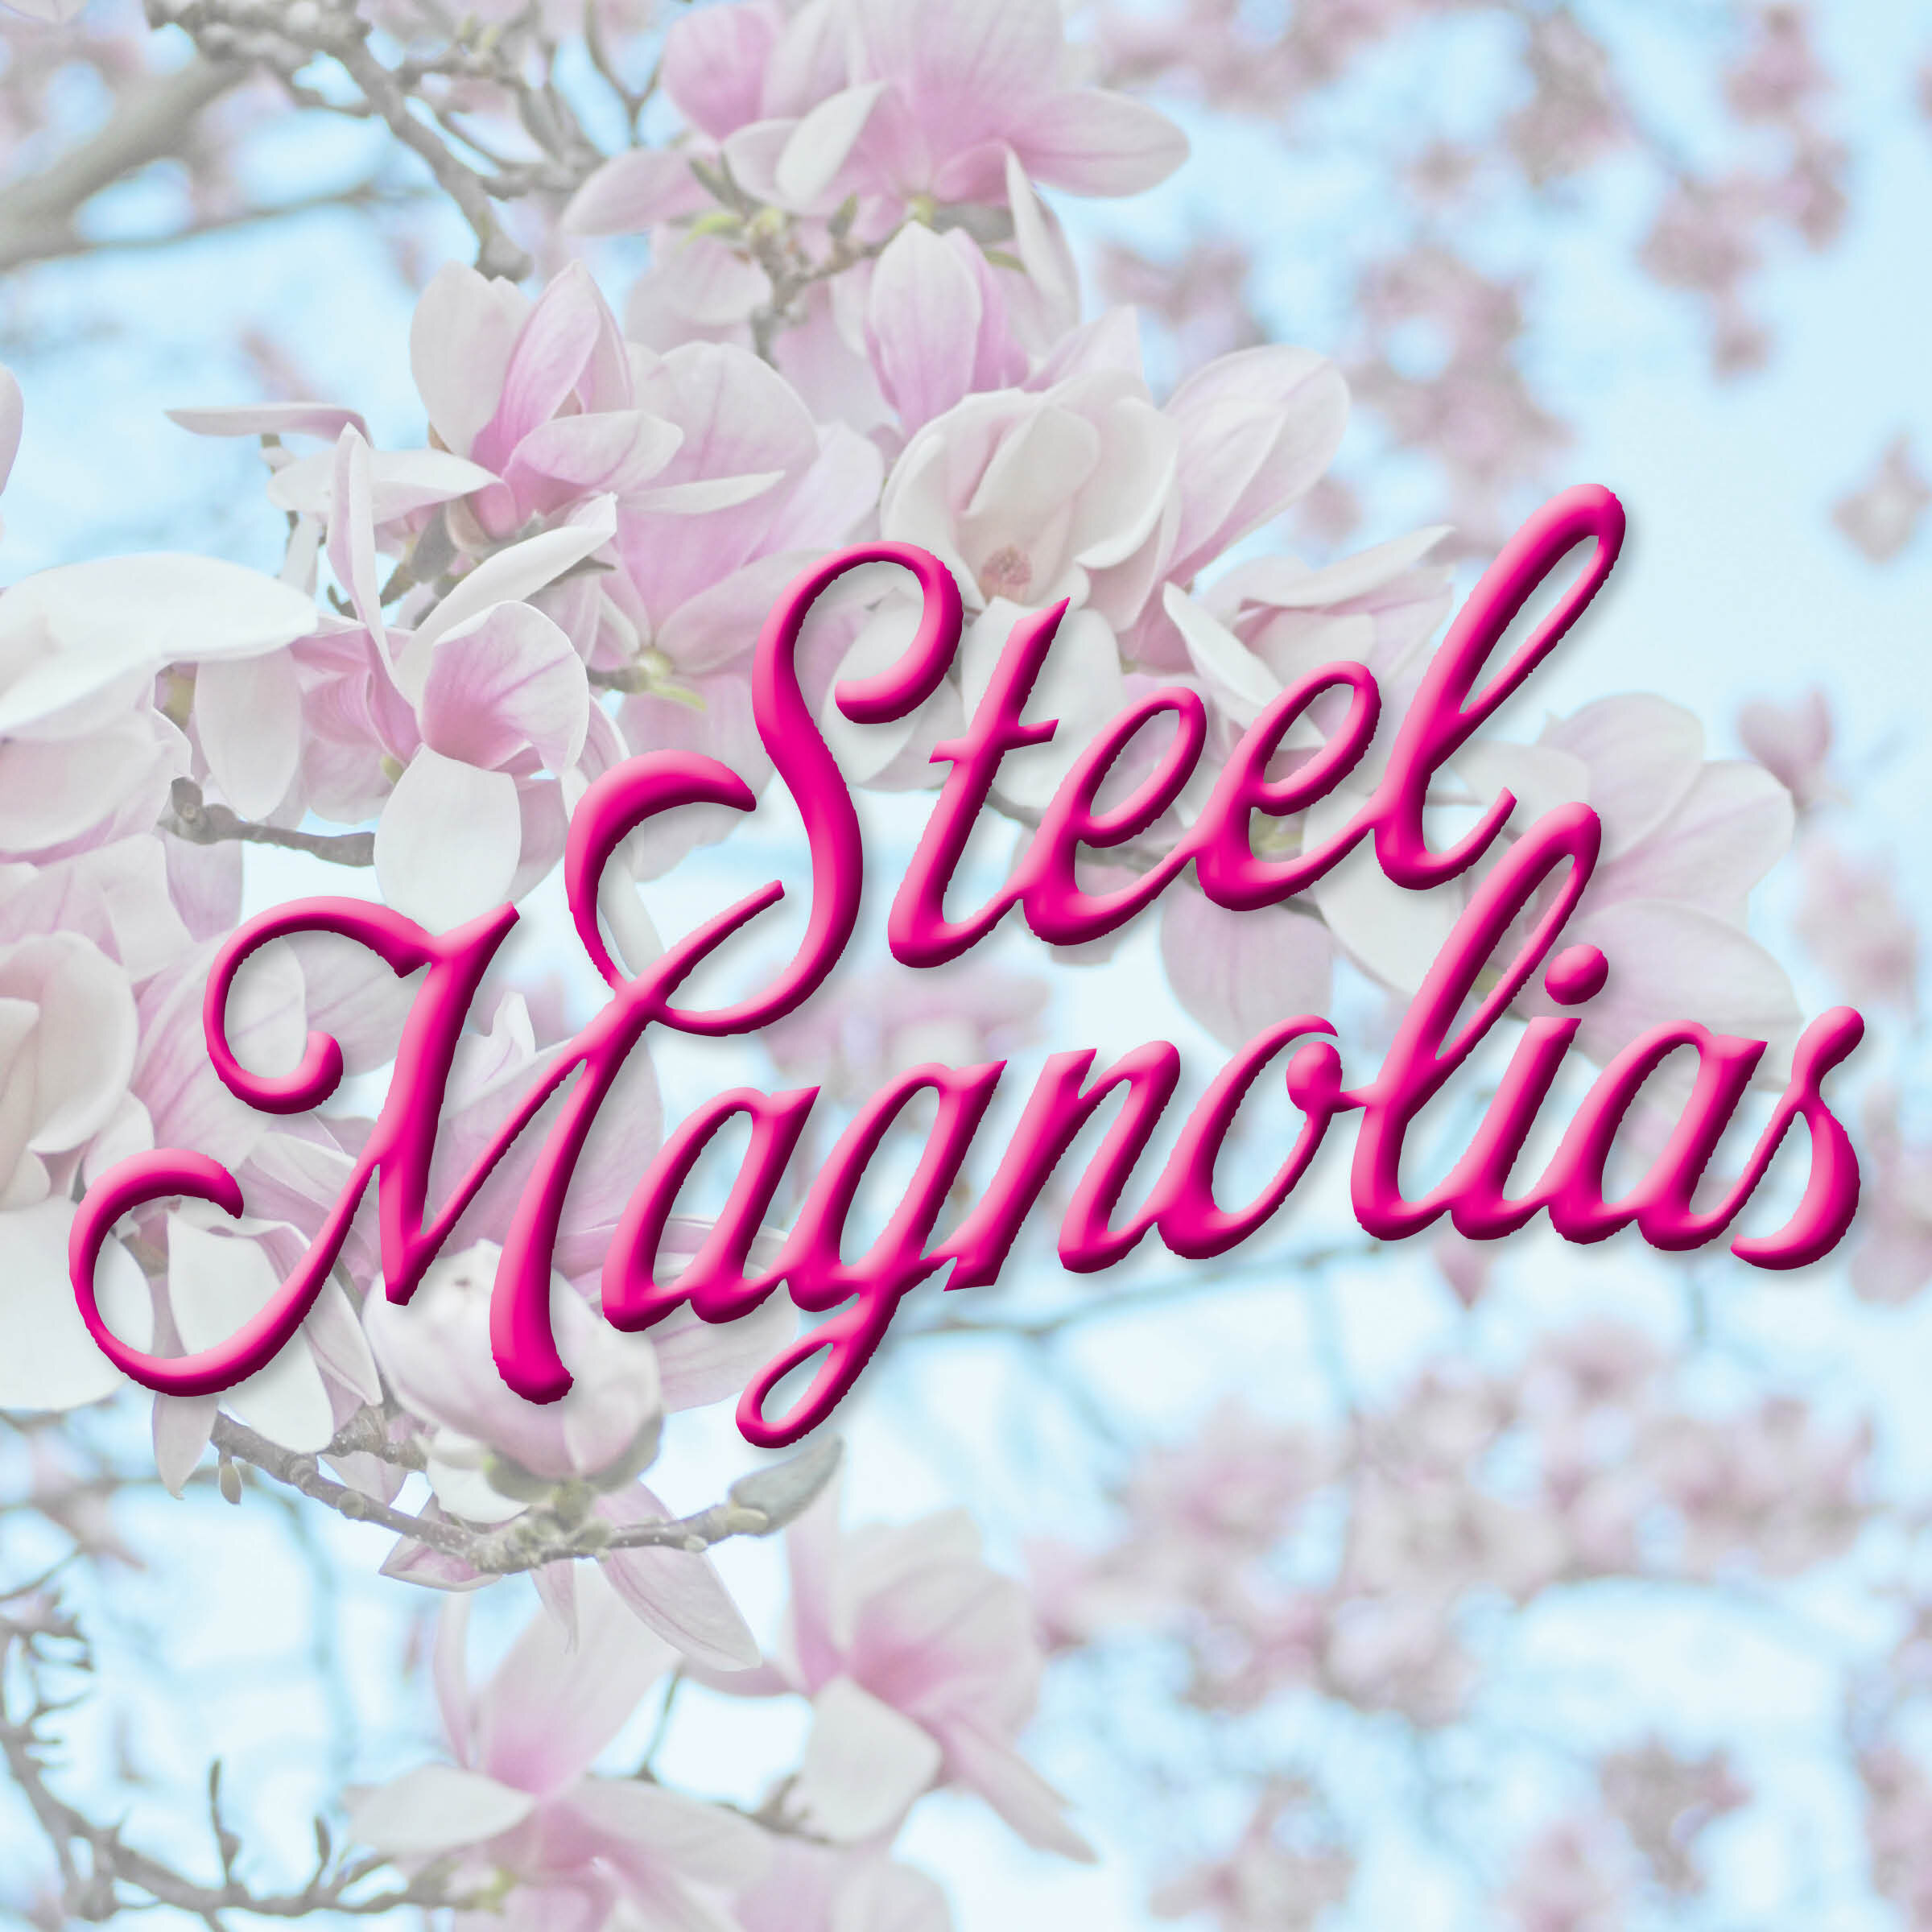 SteelMagnolias_Logo_A_Sq_New.jpg